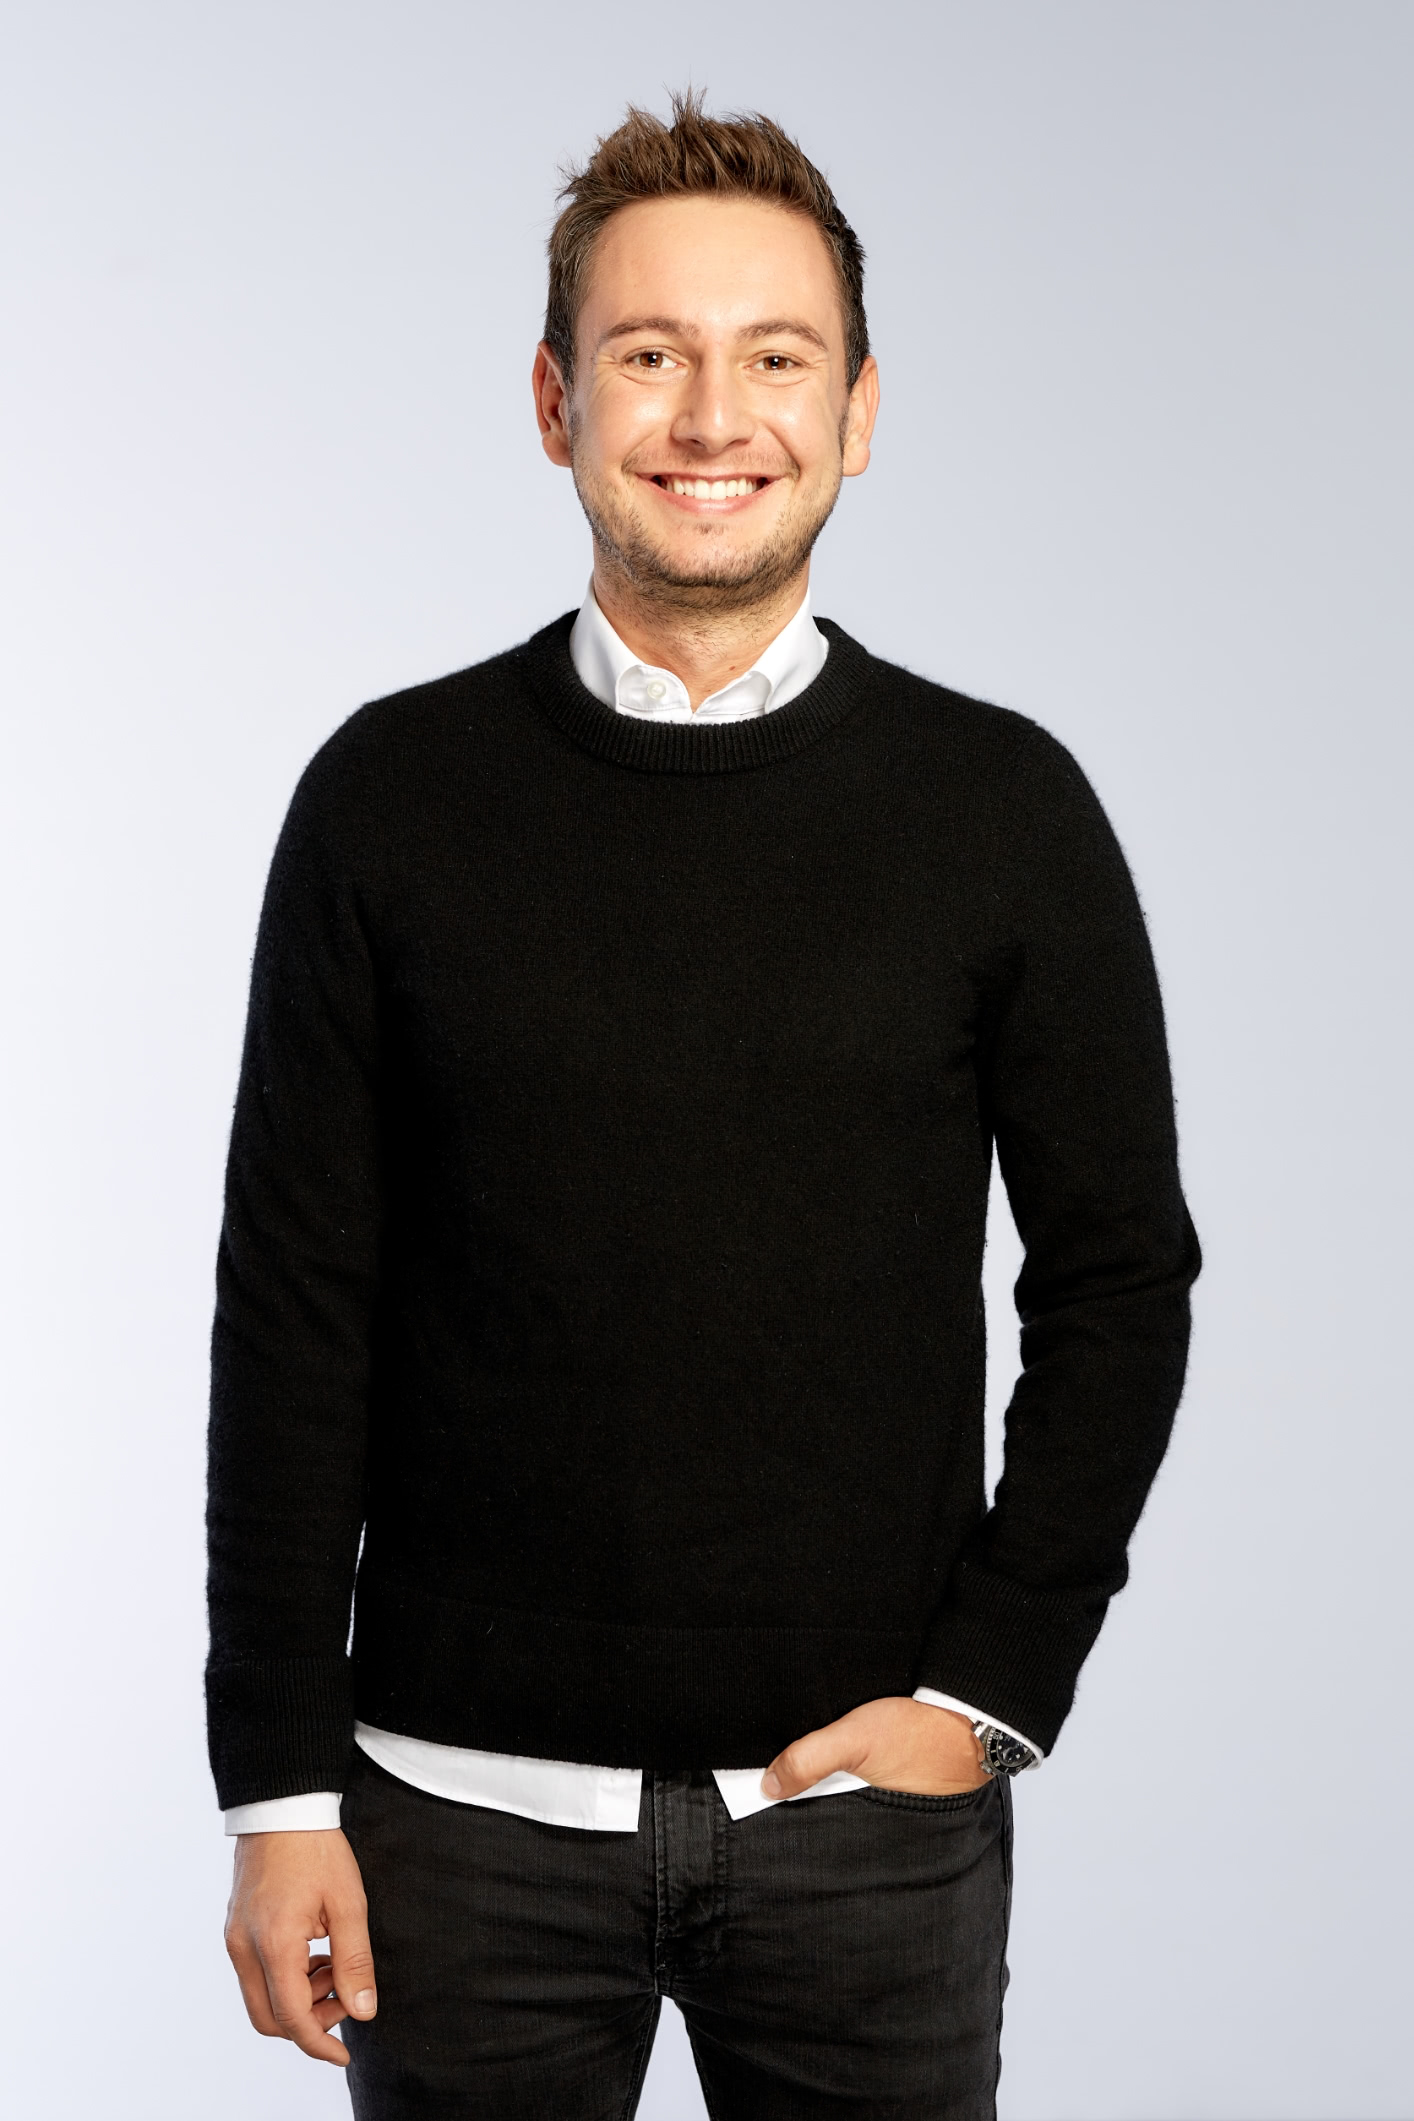 Sebastian Brendel